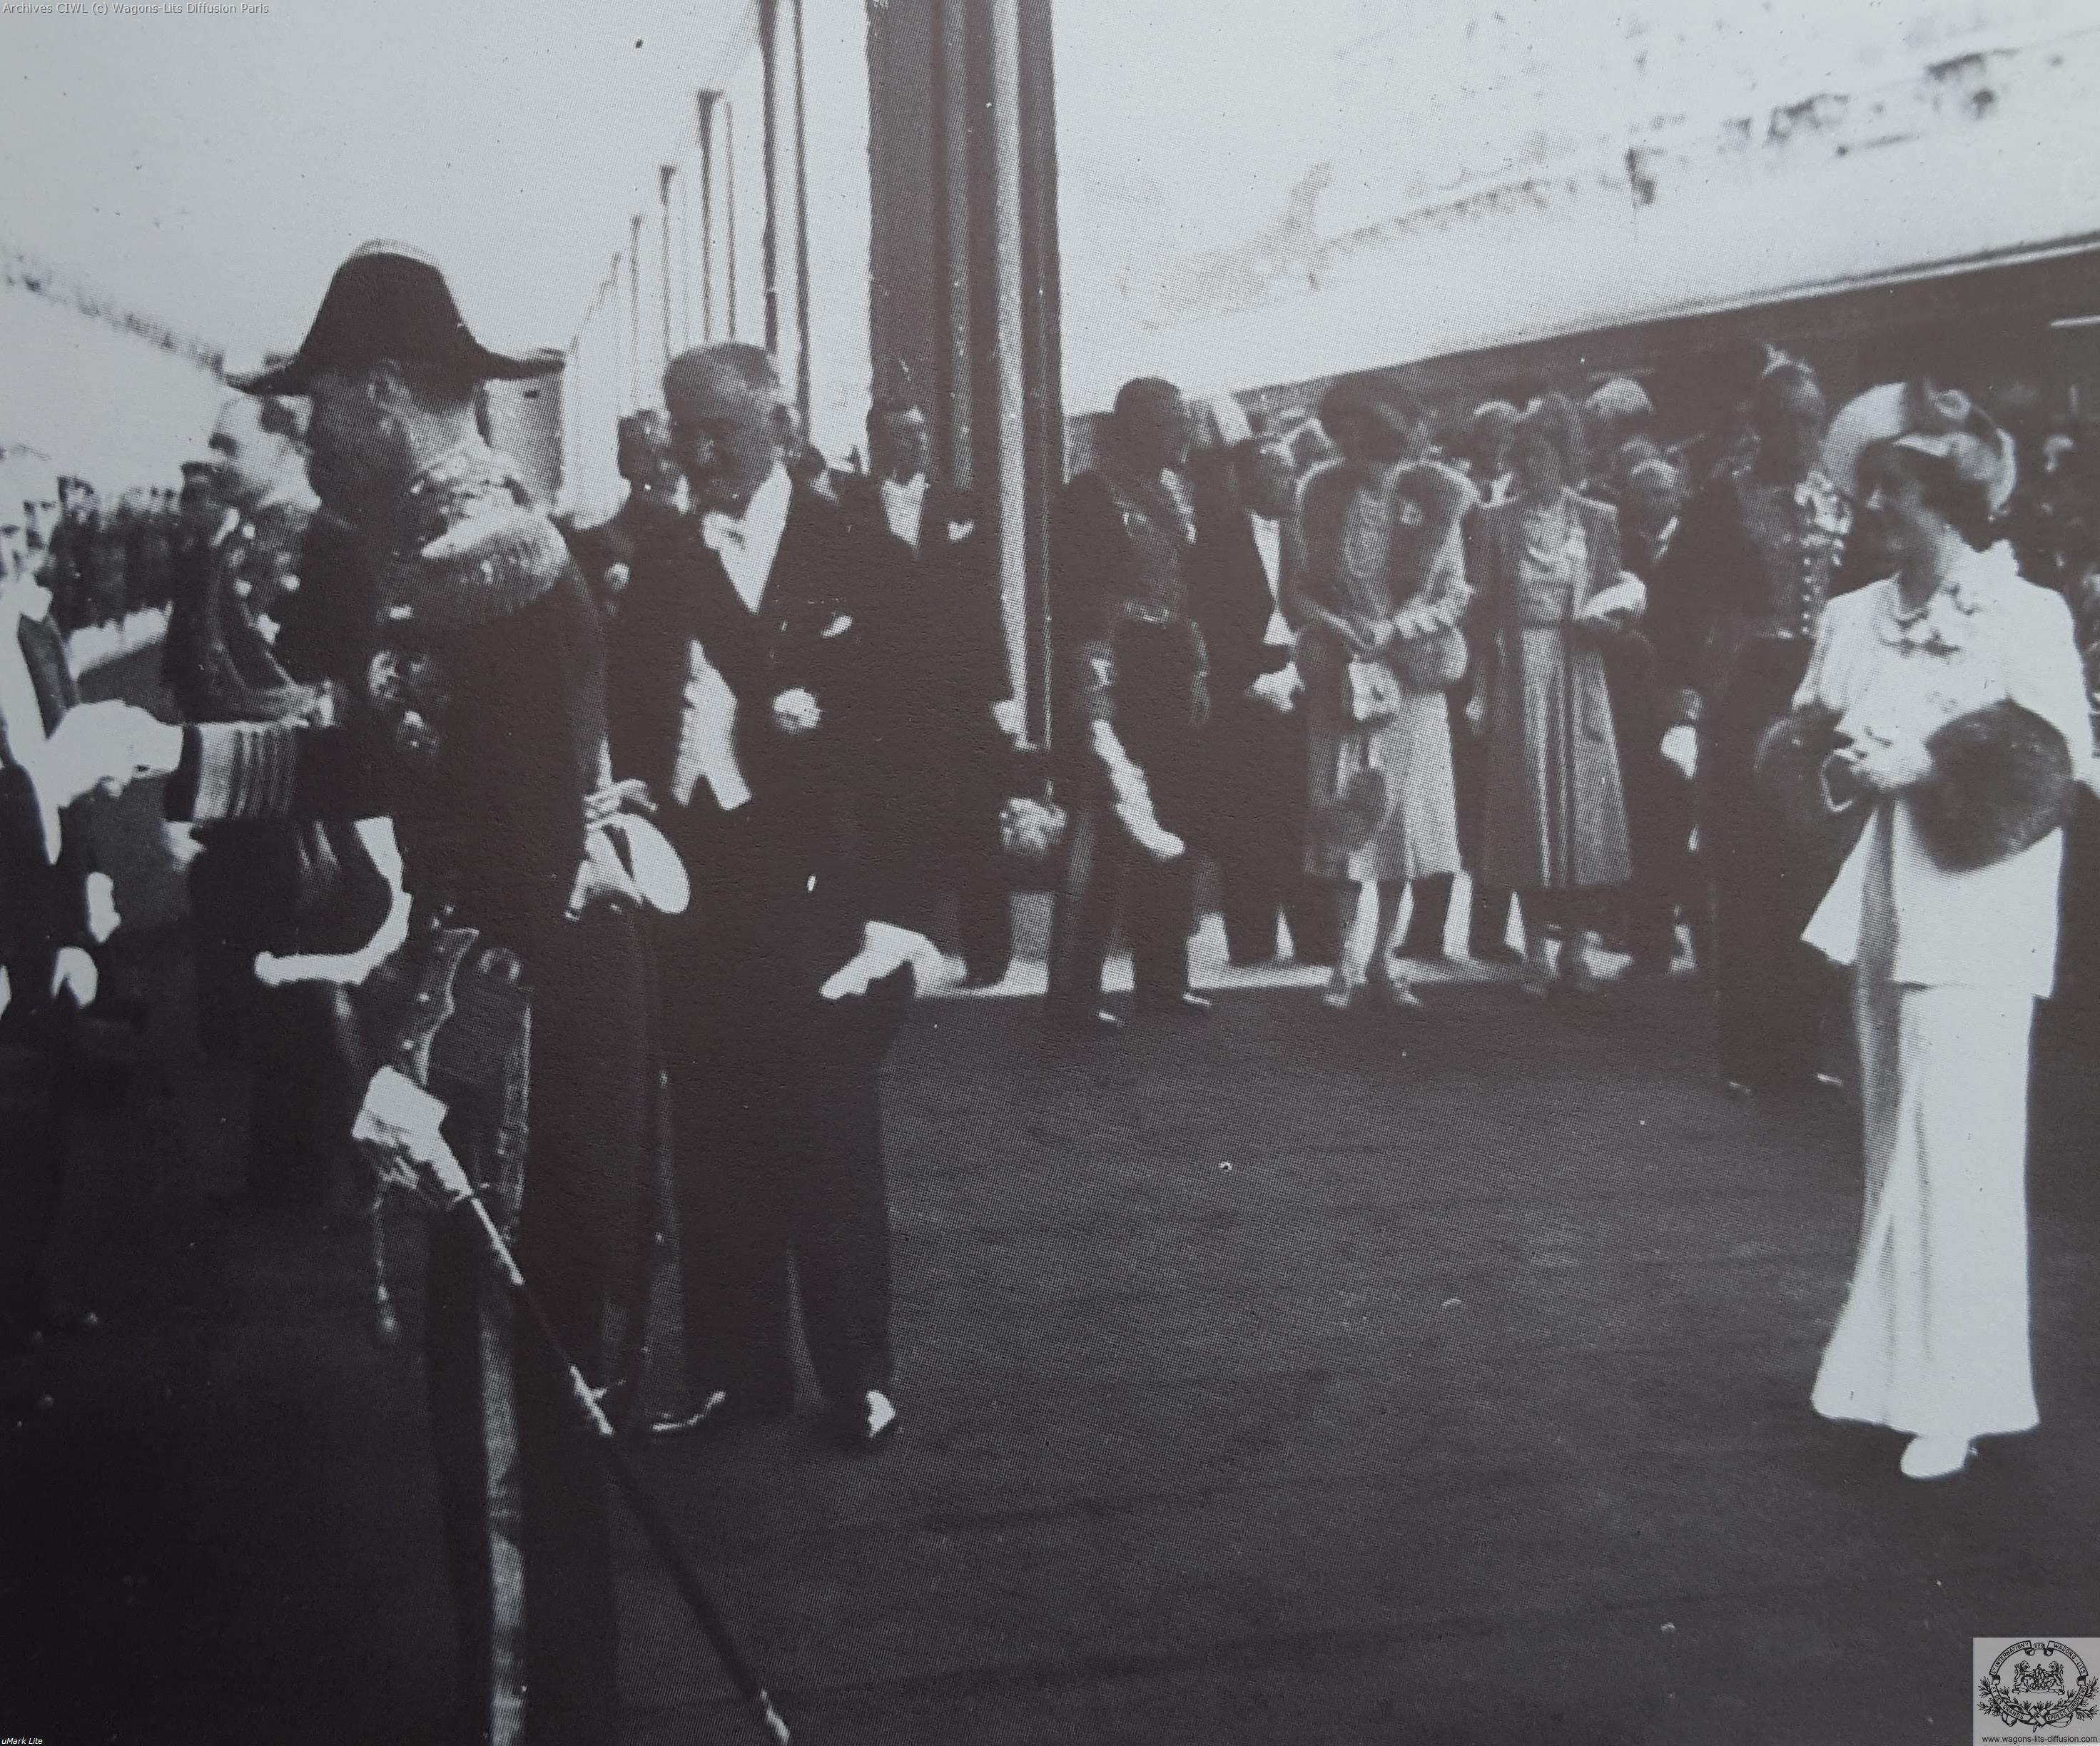 Wl george vi pres lebrun elisabeth 1938